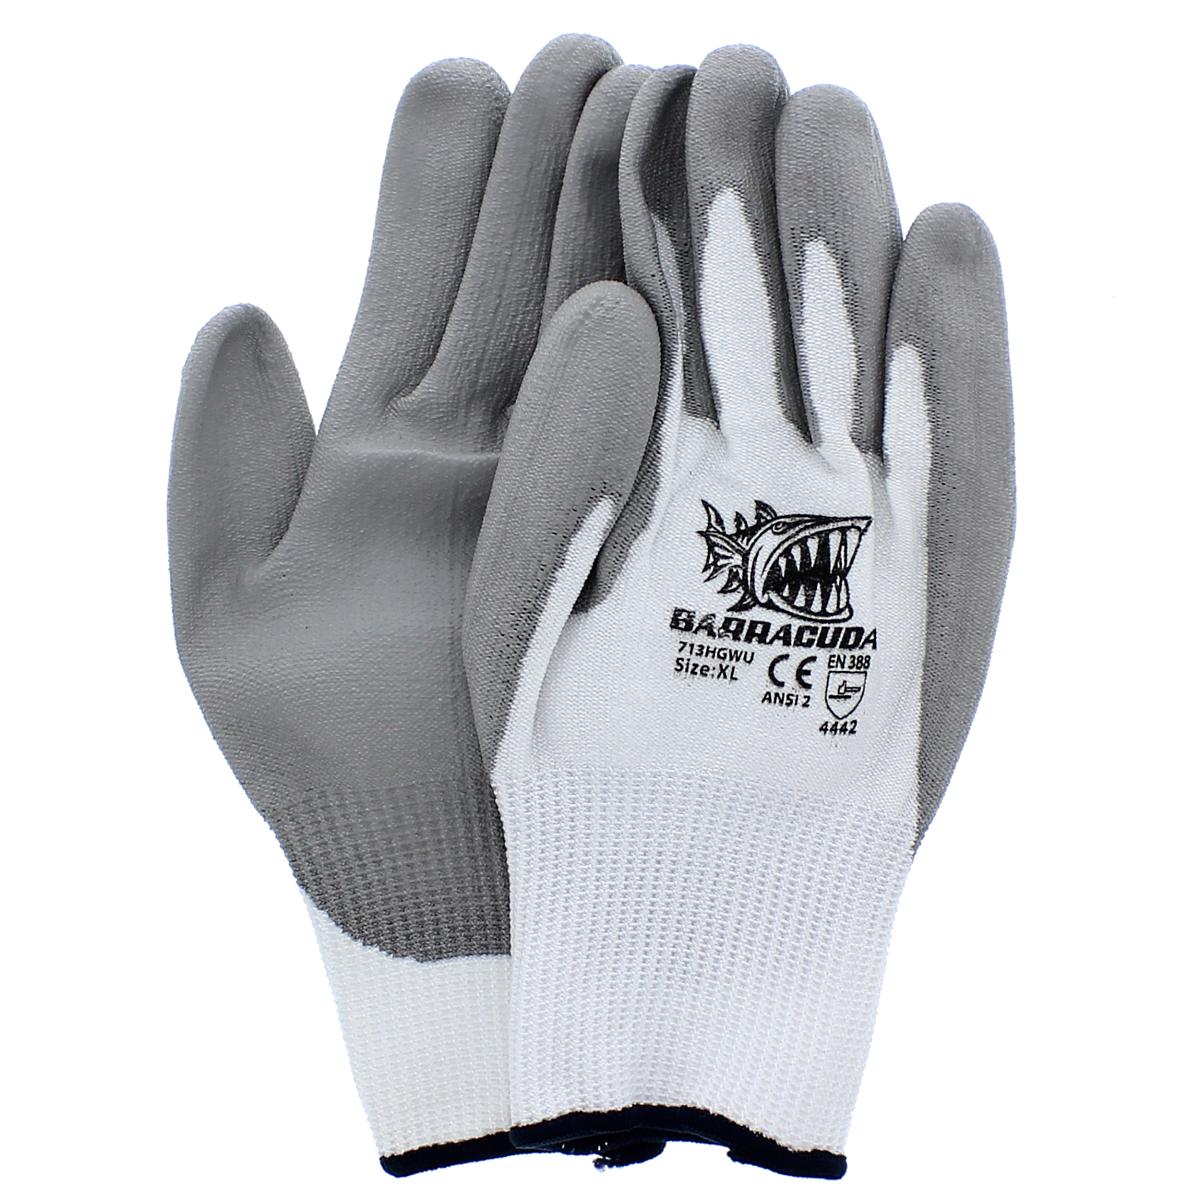 Barracuda HPPE Cut Resistant Gloves — Level 2, X-Large